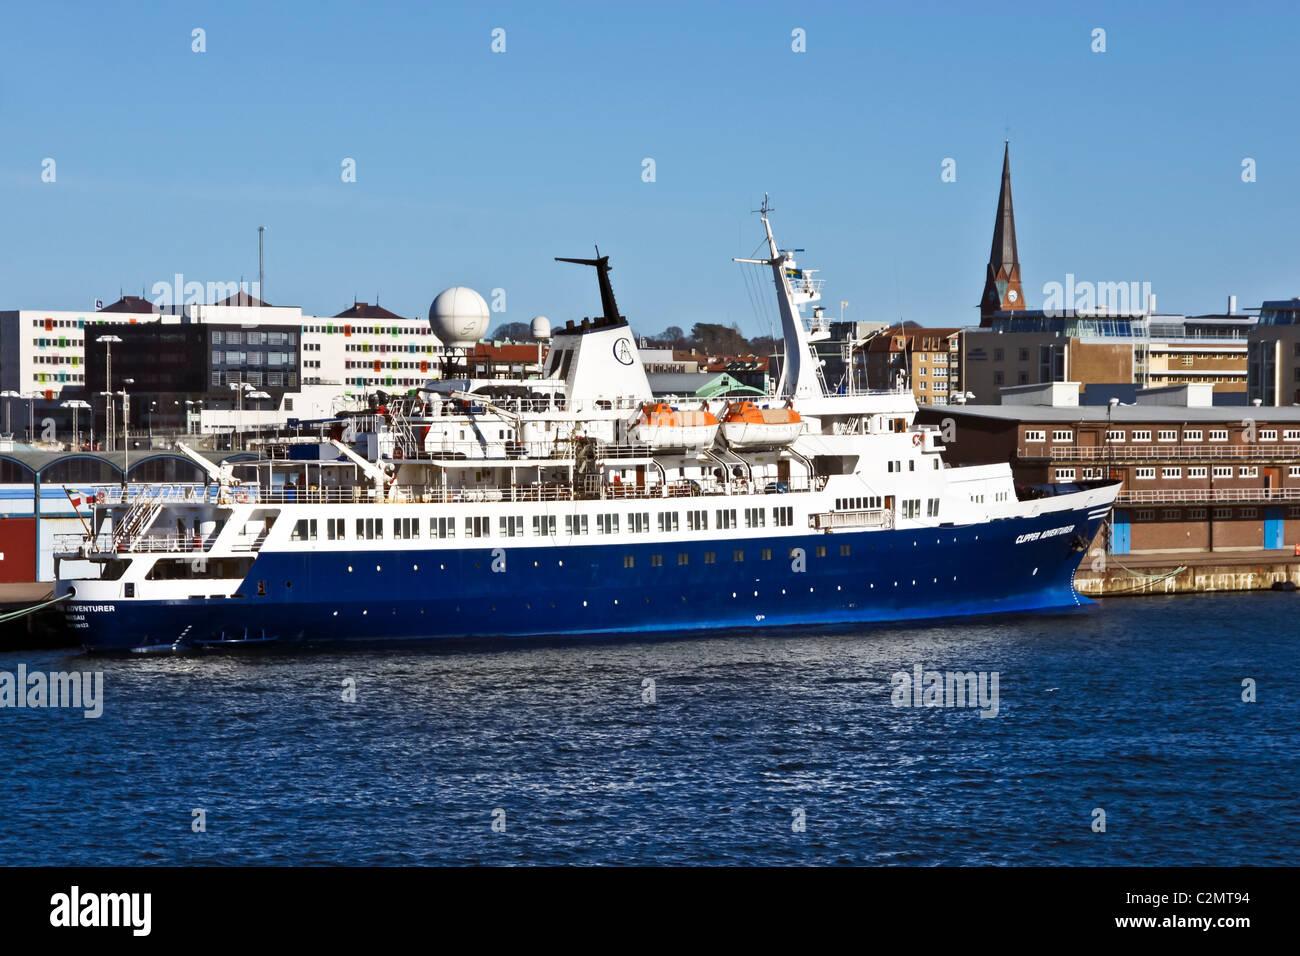 The cruise ship Clipper Adventurer moored in Helsingborg Harbour Sweden - Stock Image